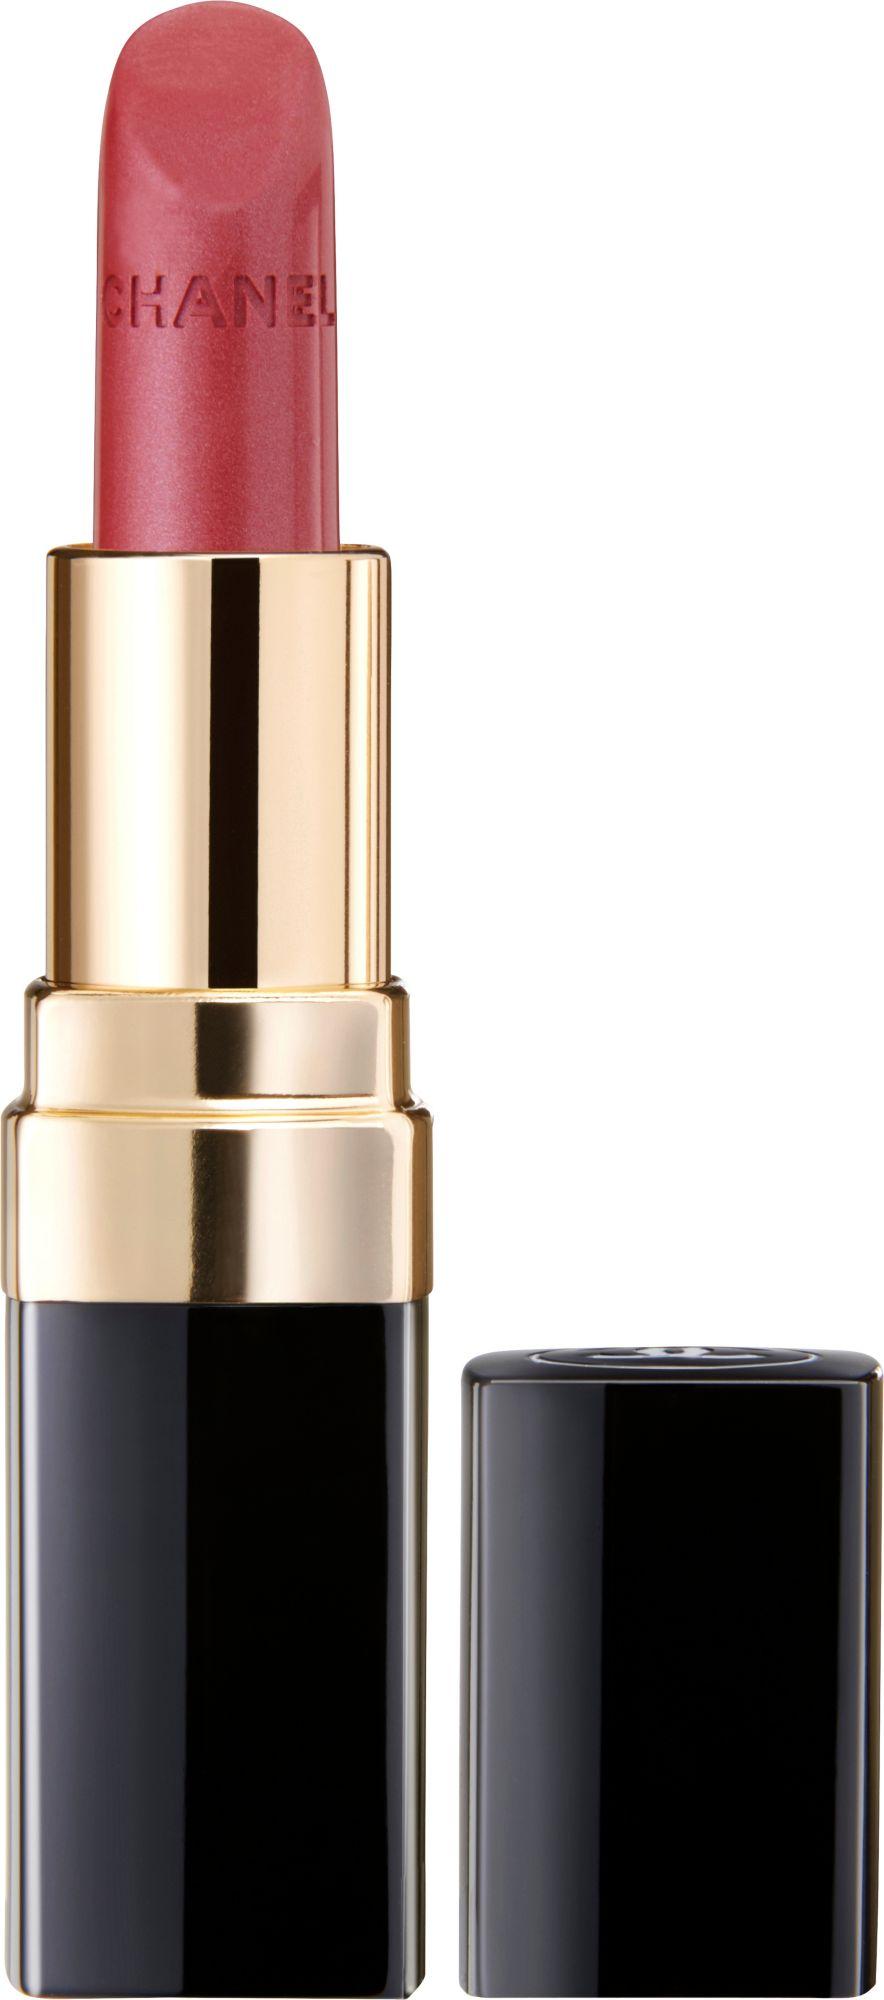 CHANEL Chanel, »Rouge Coco«, Lippenstift